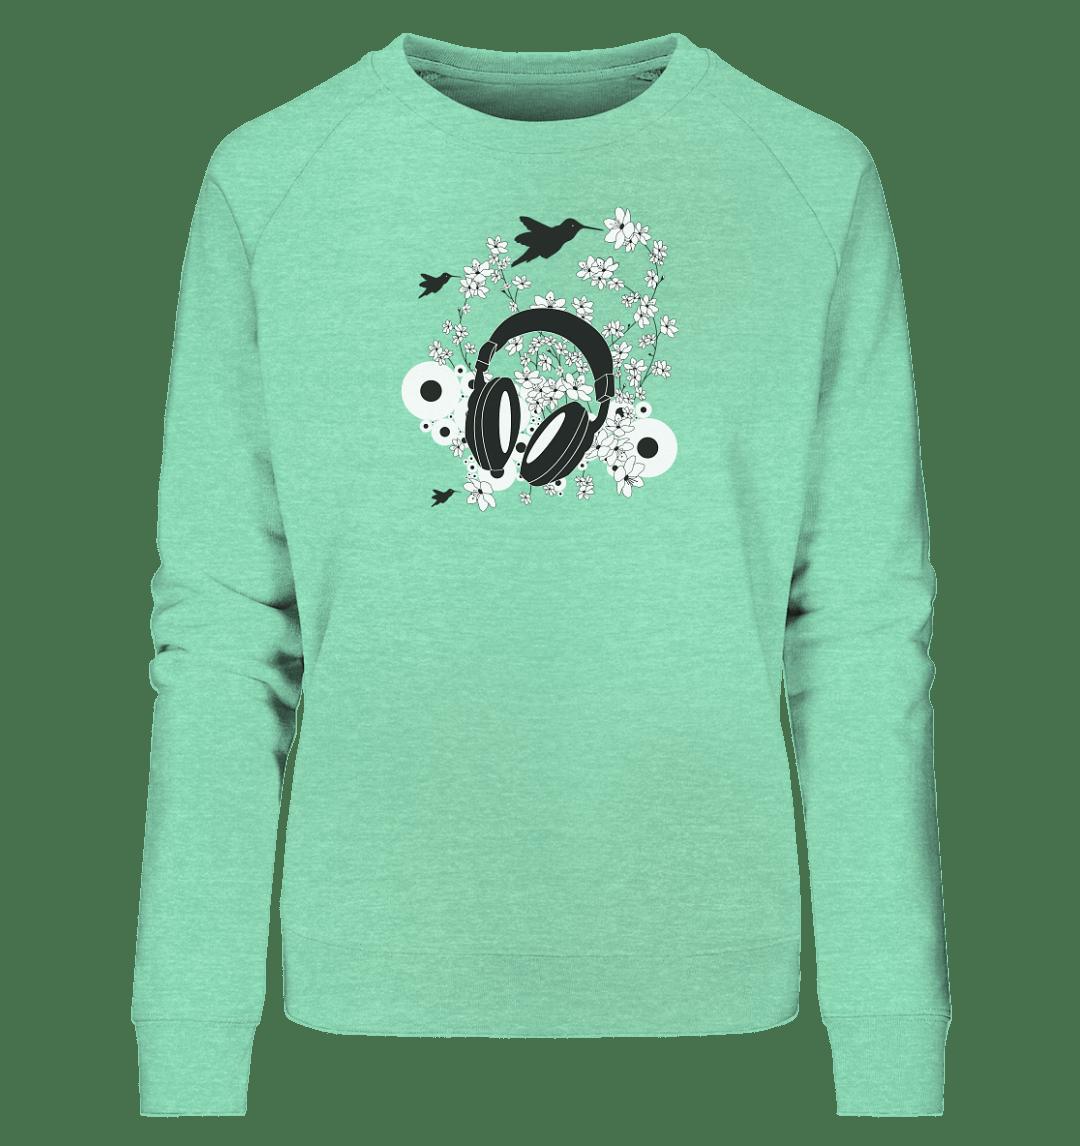 front ladies organic sweatshirt 84e5bd Cherry Blossom Sound - Ladies Organic Sweatshirt